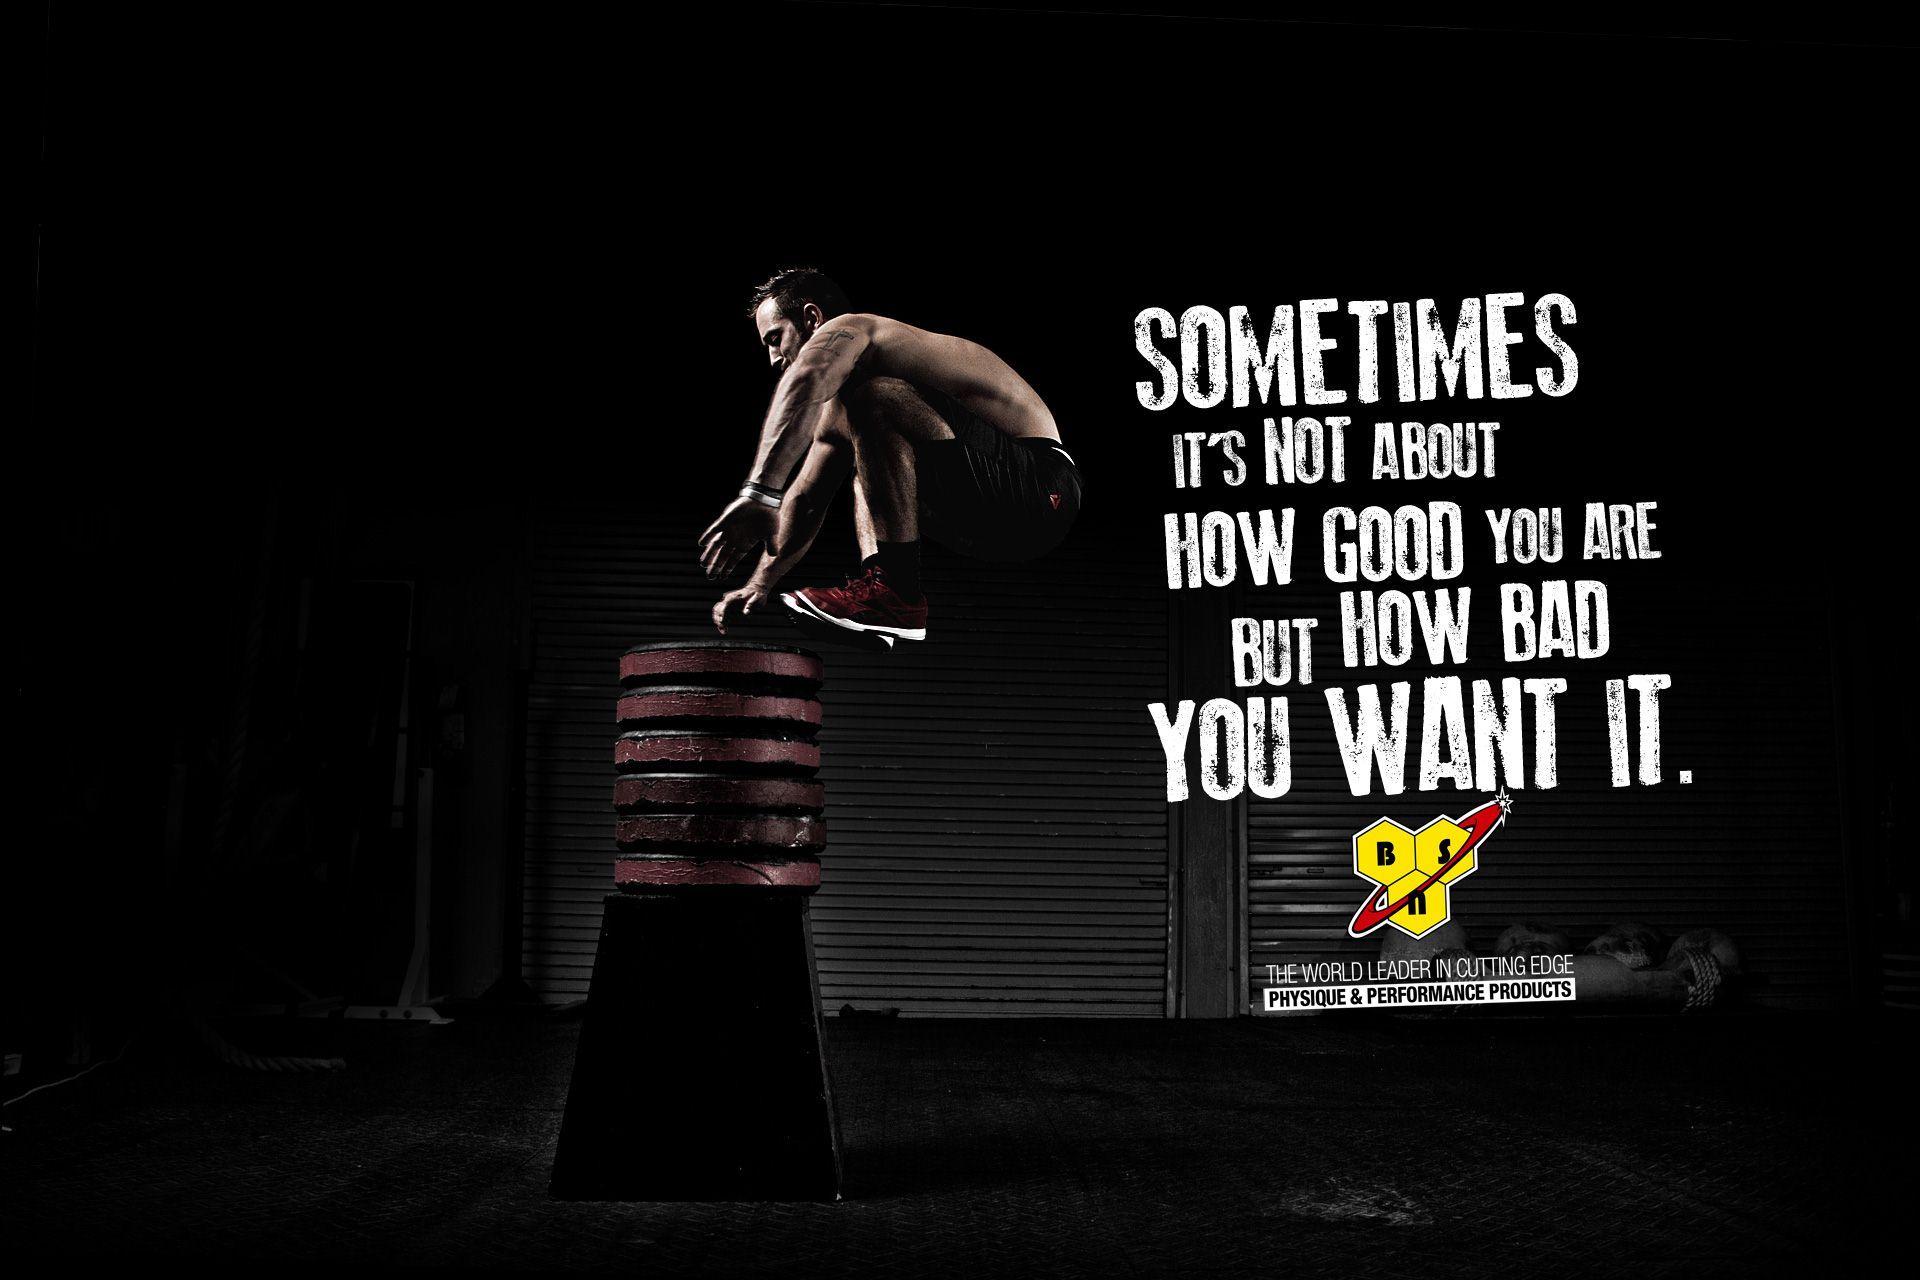 crossfit motivational wallpaper